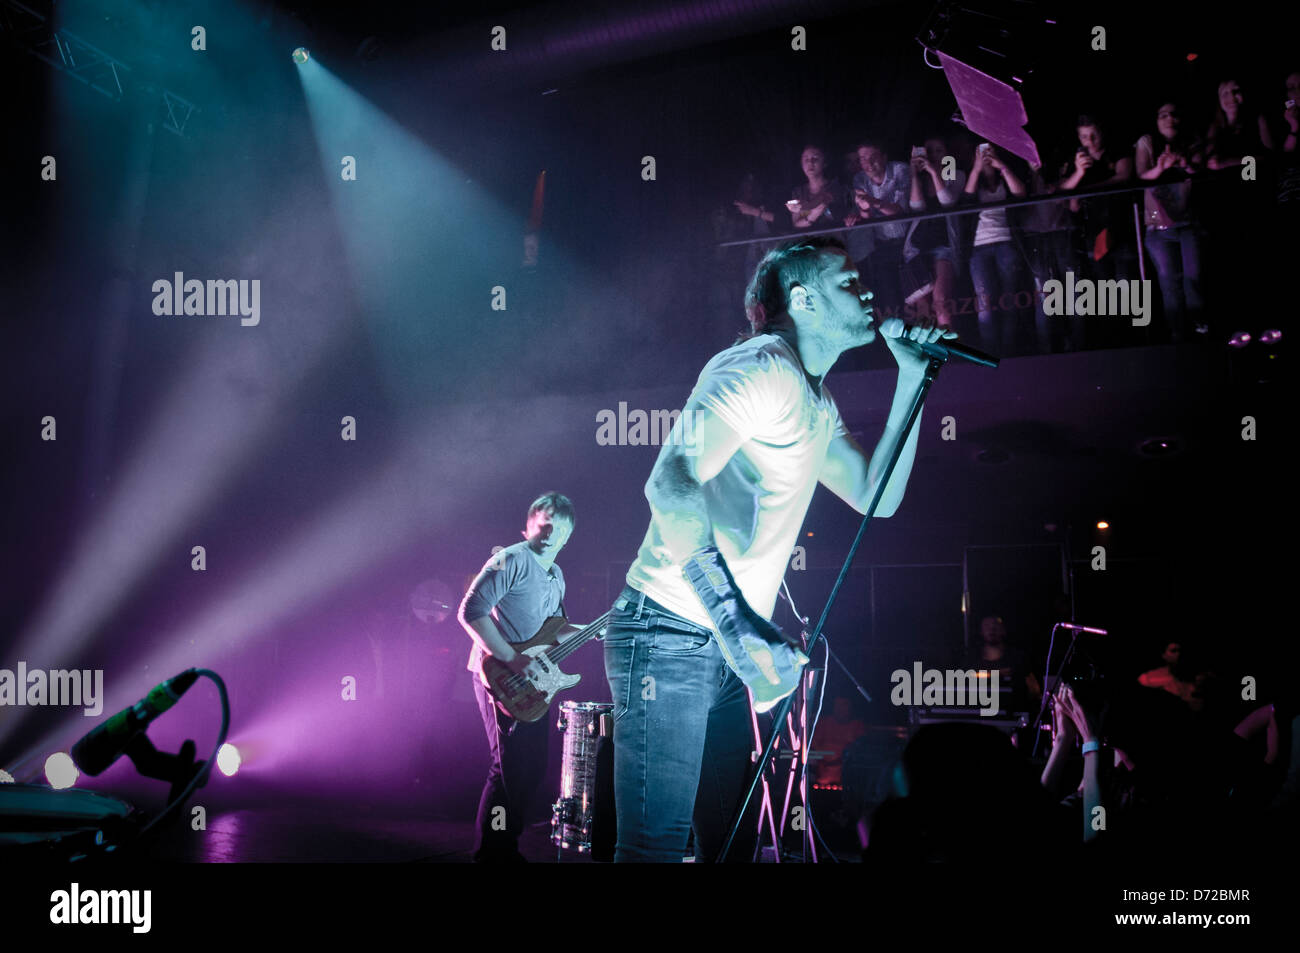 Imagine Dragons with lead singer Dan Reynolds live on Night Visions World Tour, Prague, Sasazu. - Stock Image